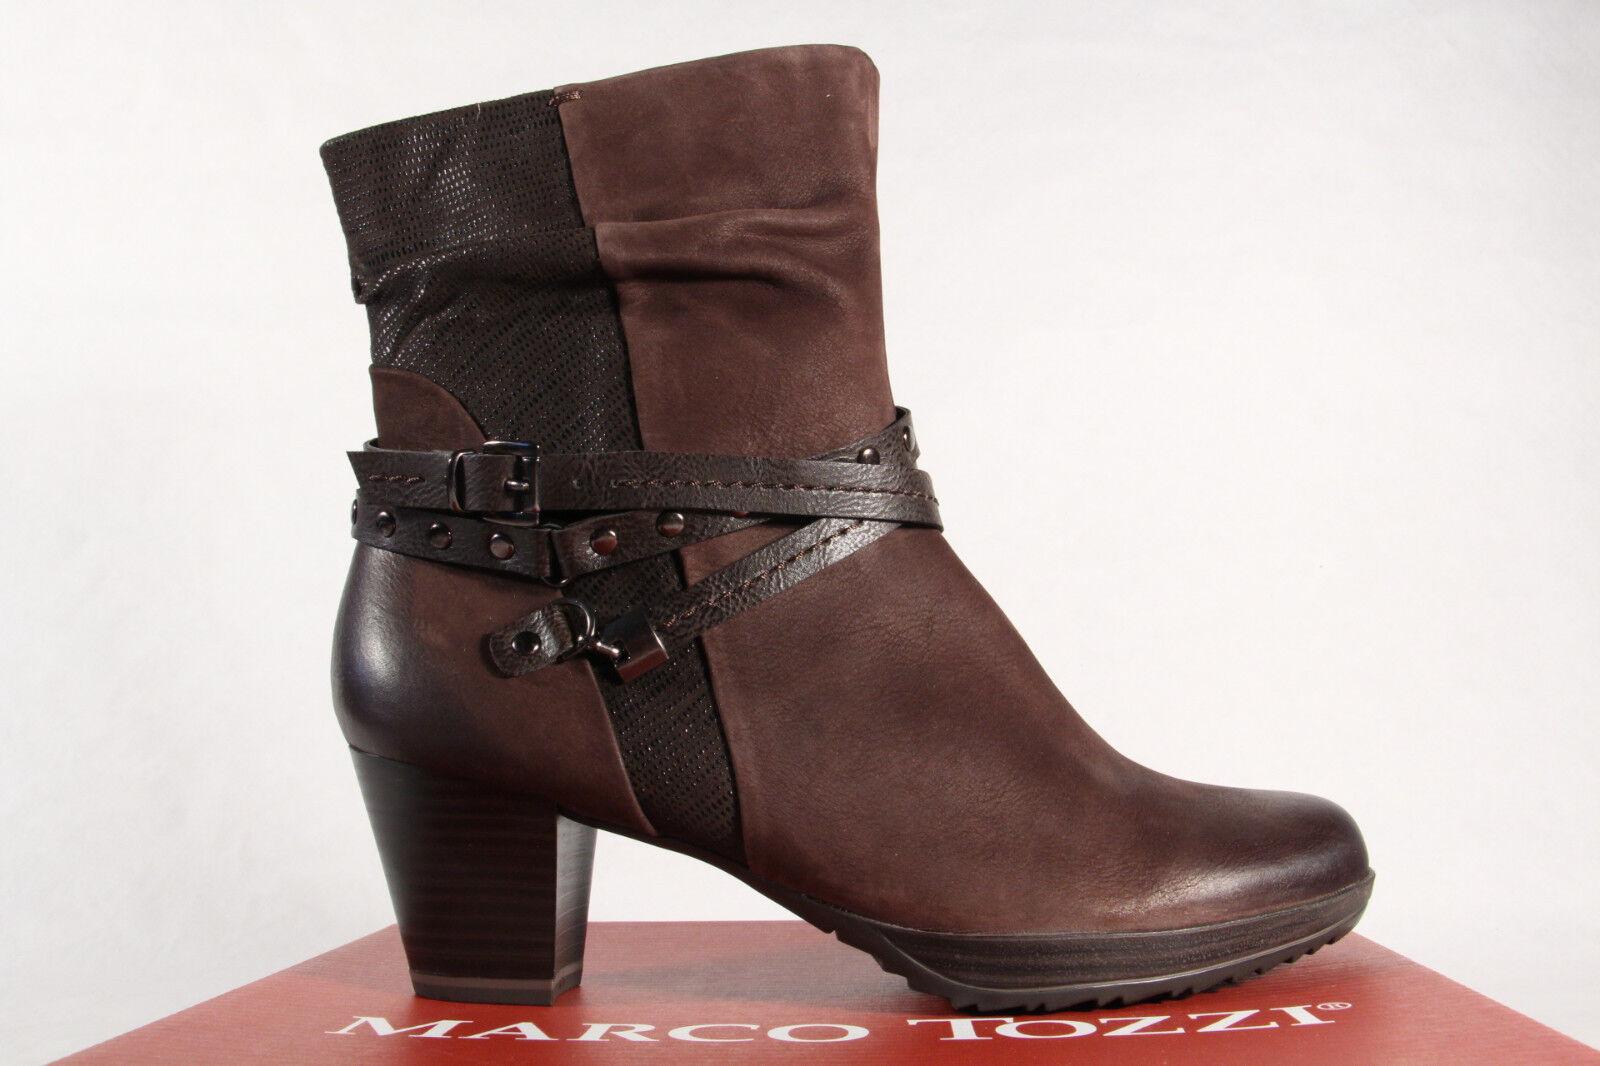 Marco Tozzi Damen Stiefel 25421 Stiefelette Boots Echtleder braun NEU!